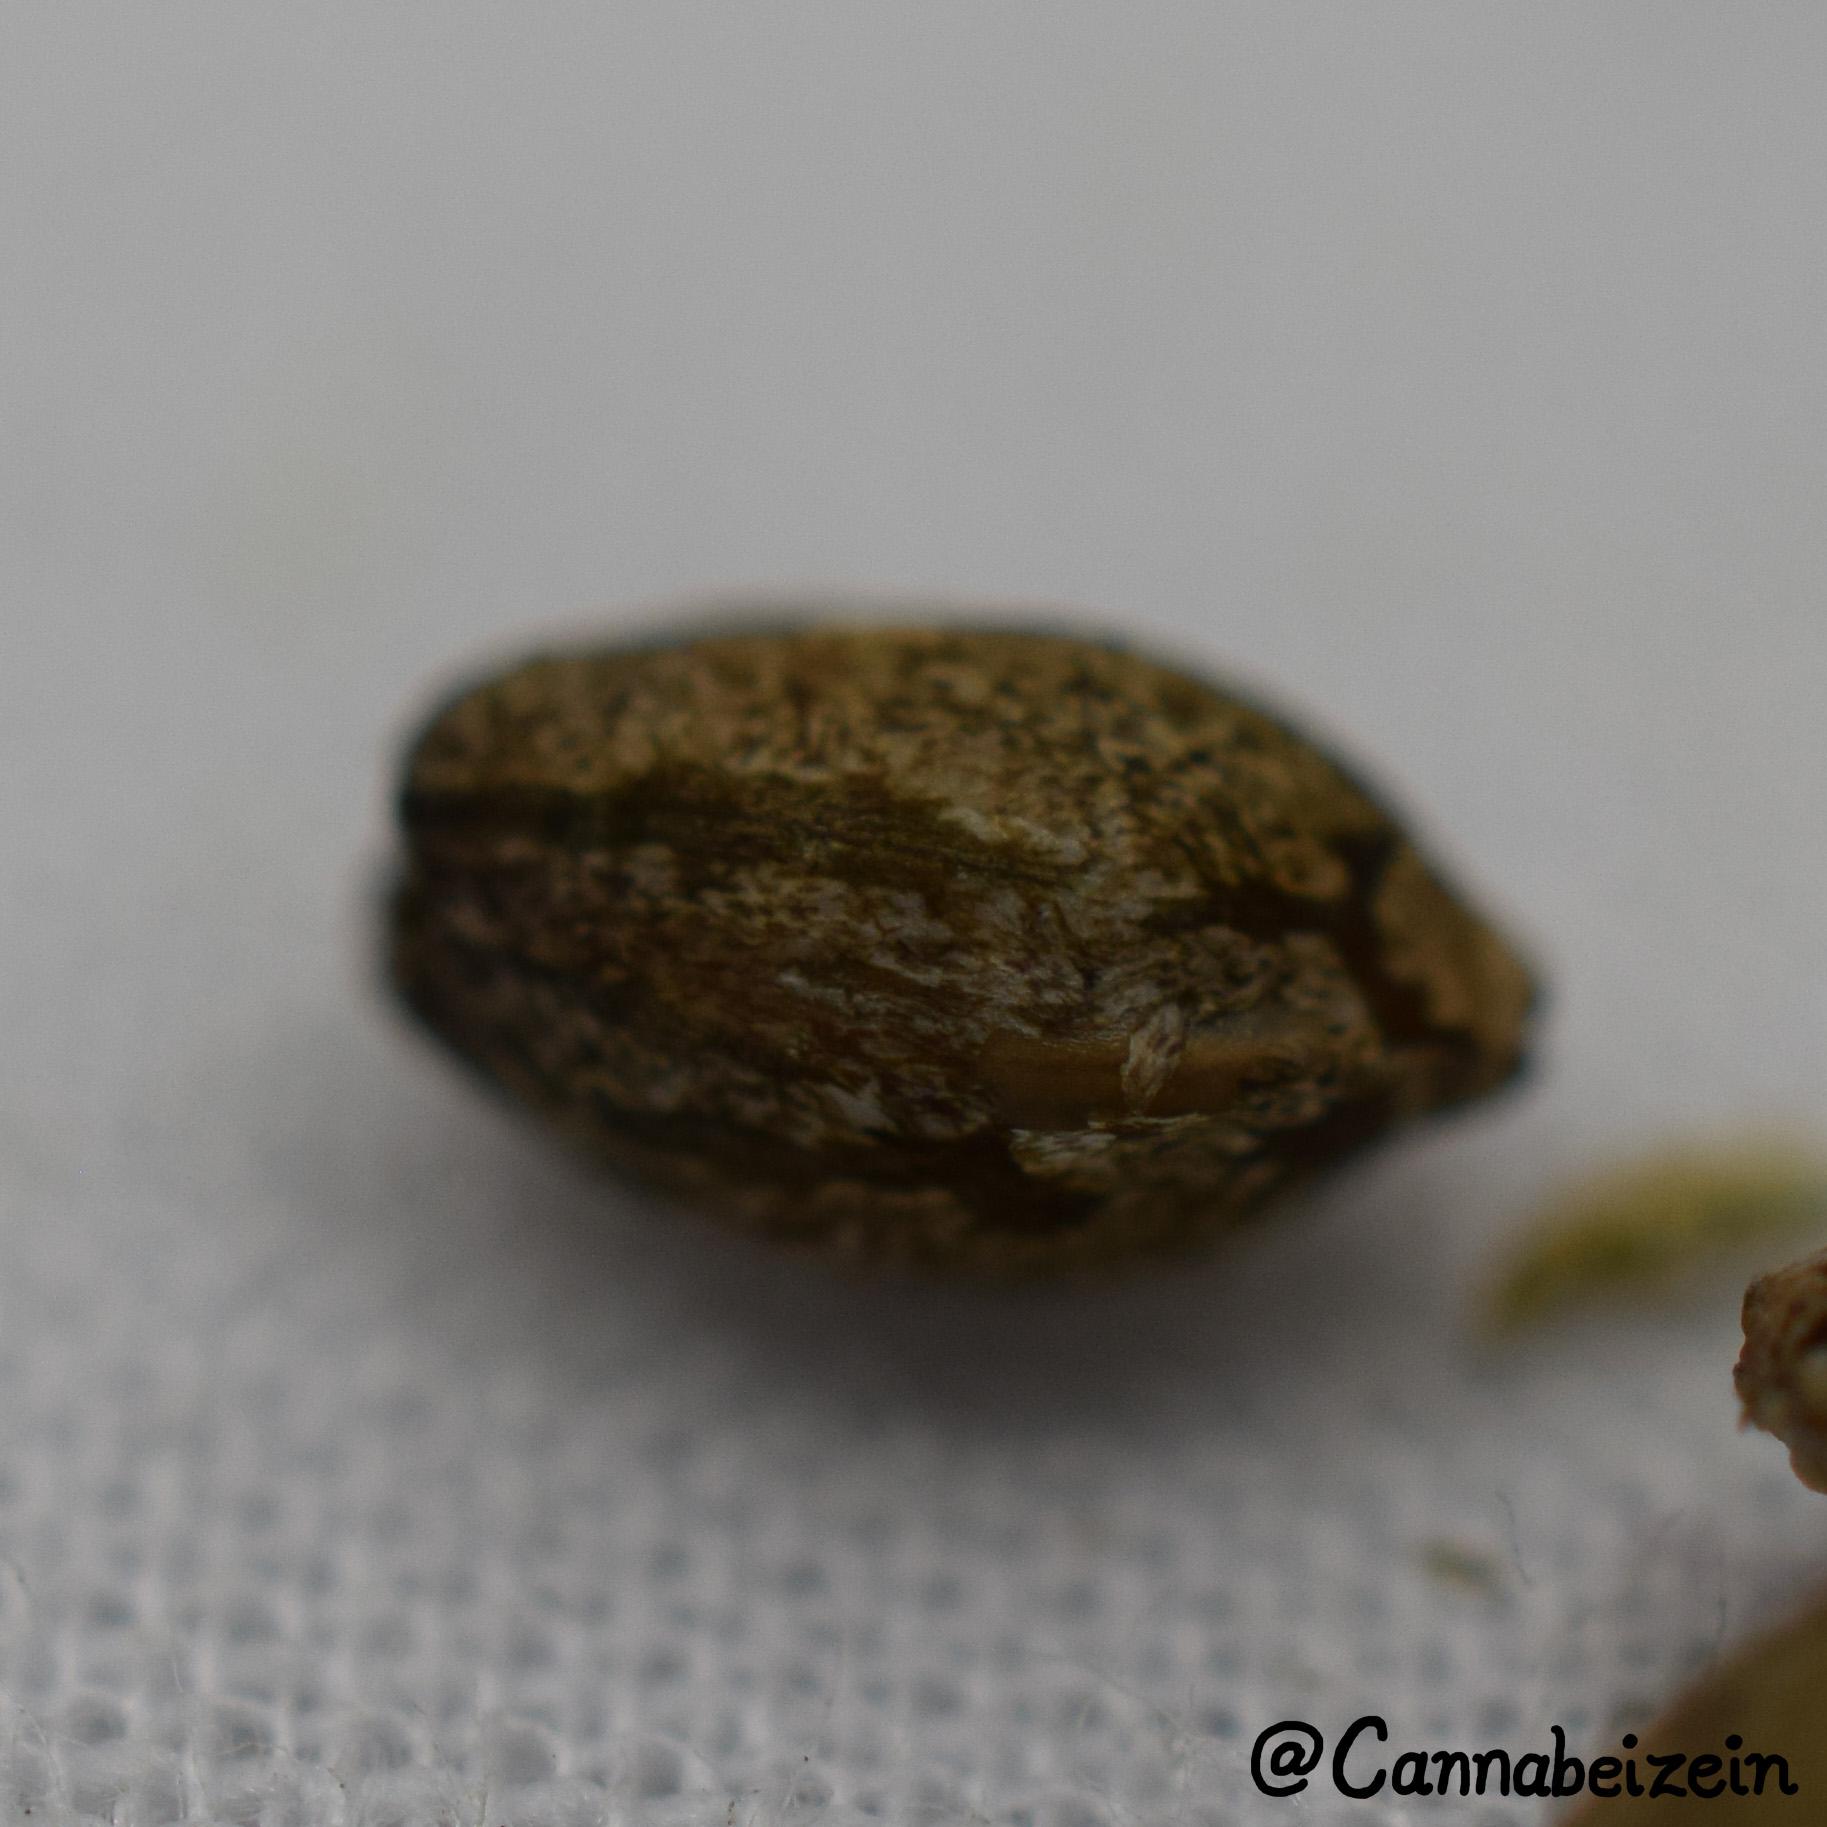 Cannabeizein 0217 - Mystery Mix Seeds - DSC_0799 copy.jpg